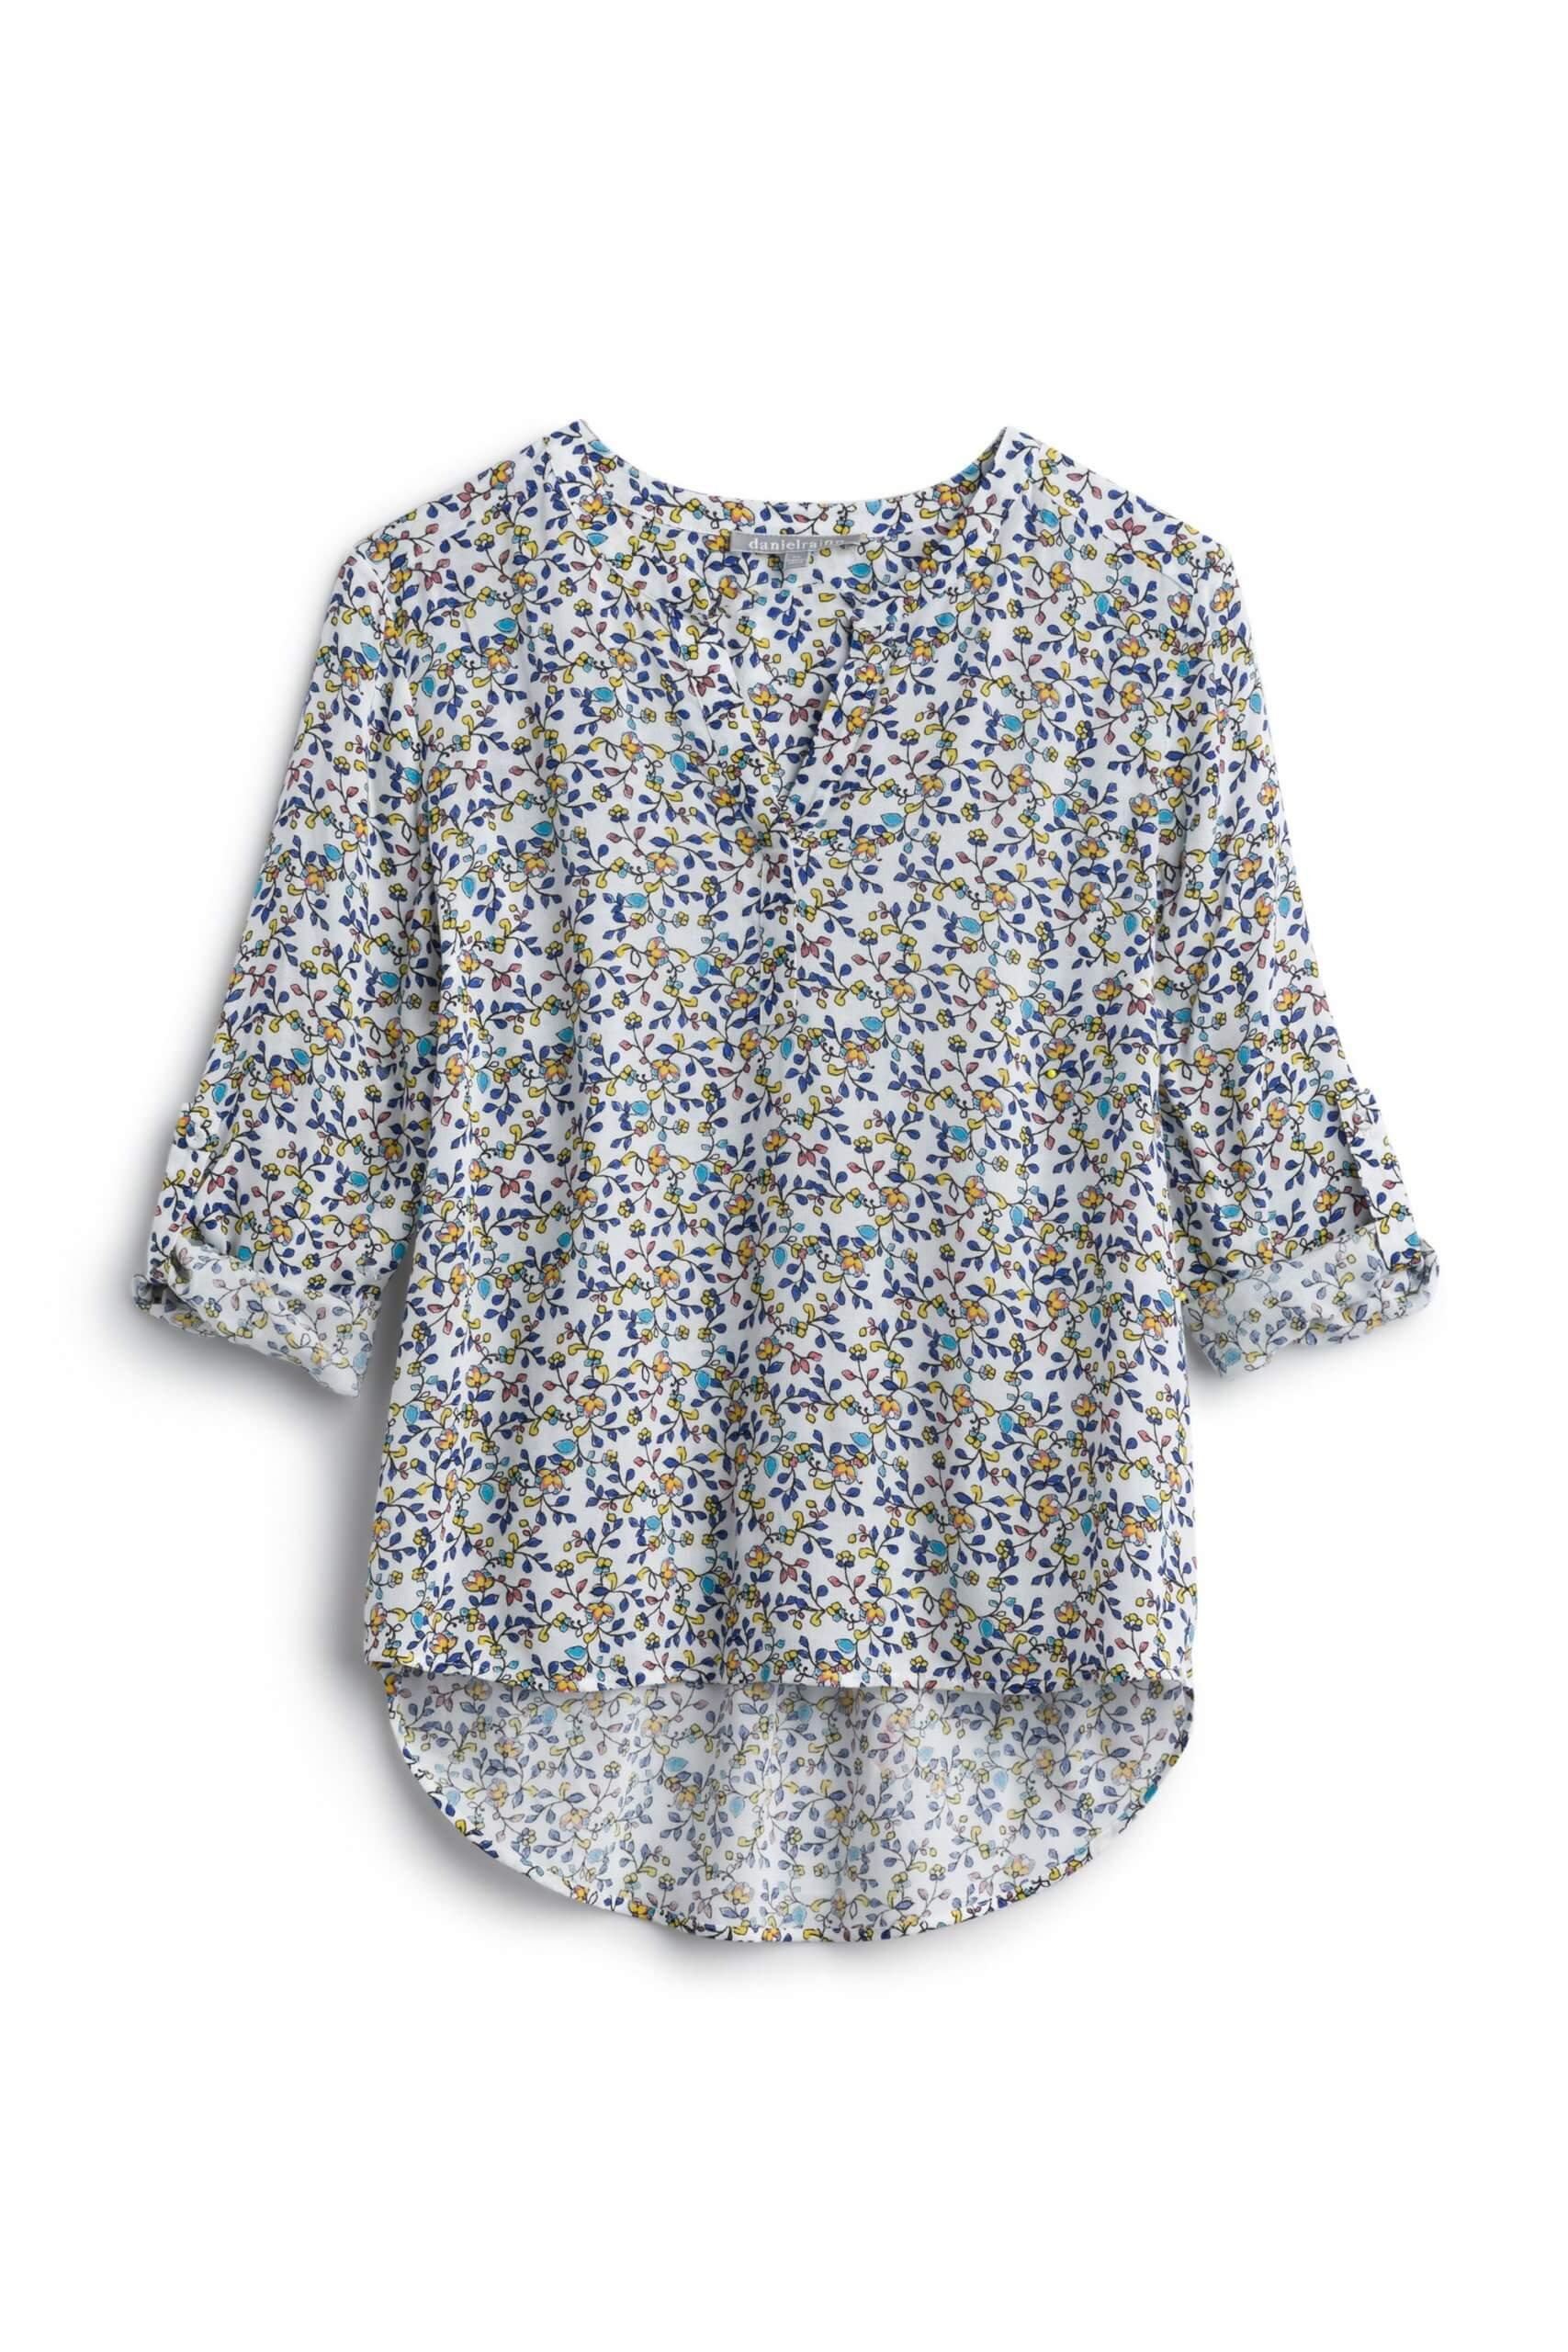 Stitch Fix Women's white three-quarter sleeve floral blouse.